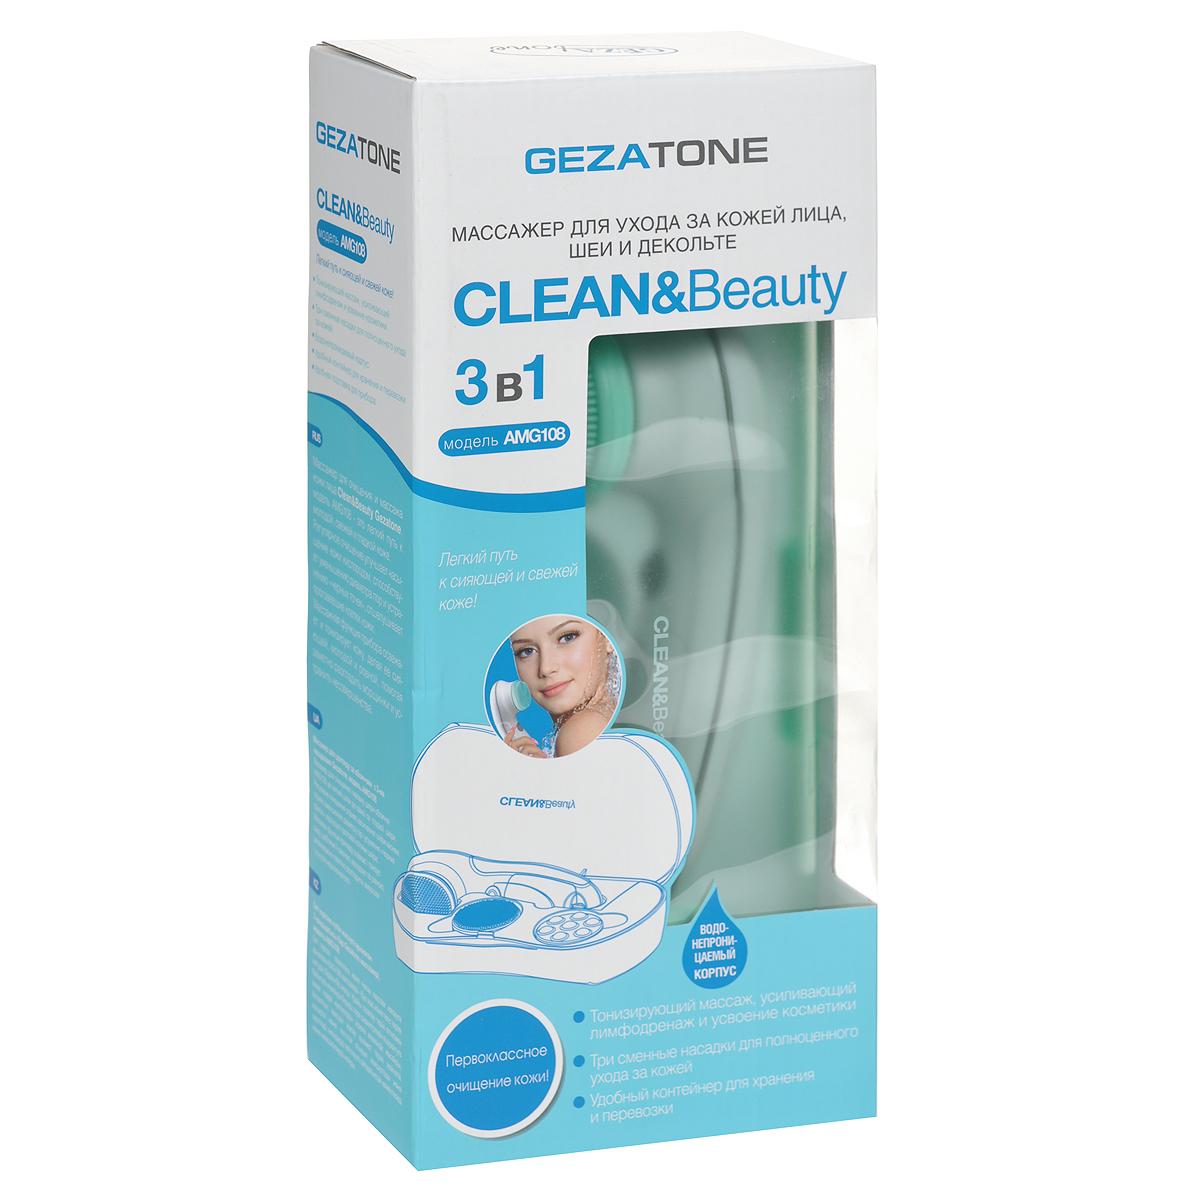 GezatoneАппарат для чистки лица и ухода за кожей Clean&Beauty  AMG108 Gezatone